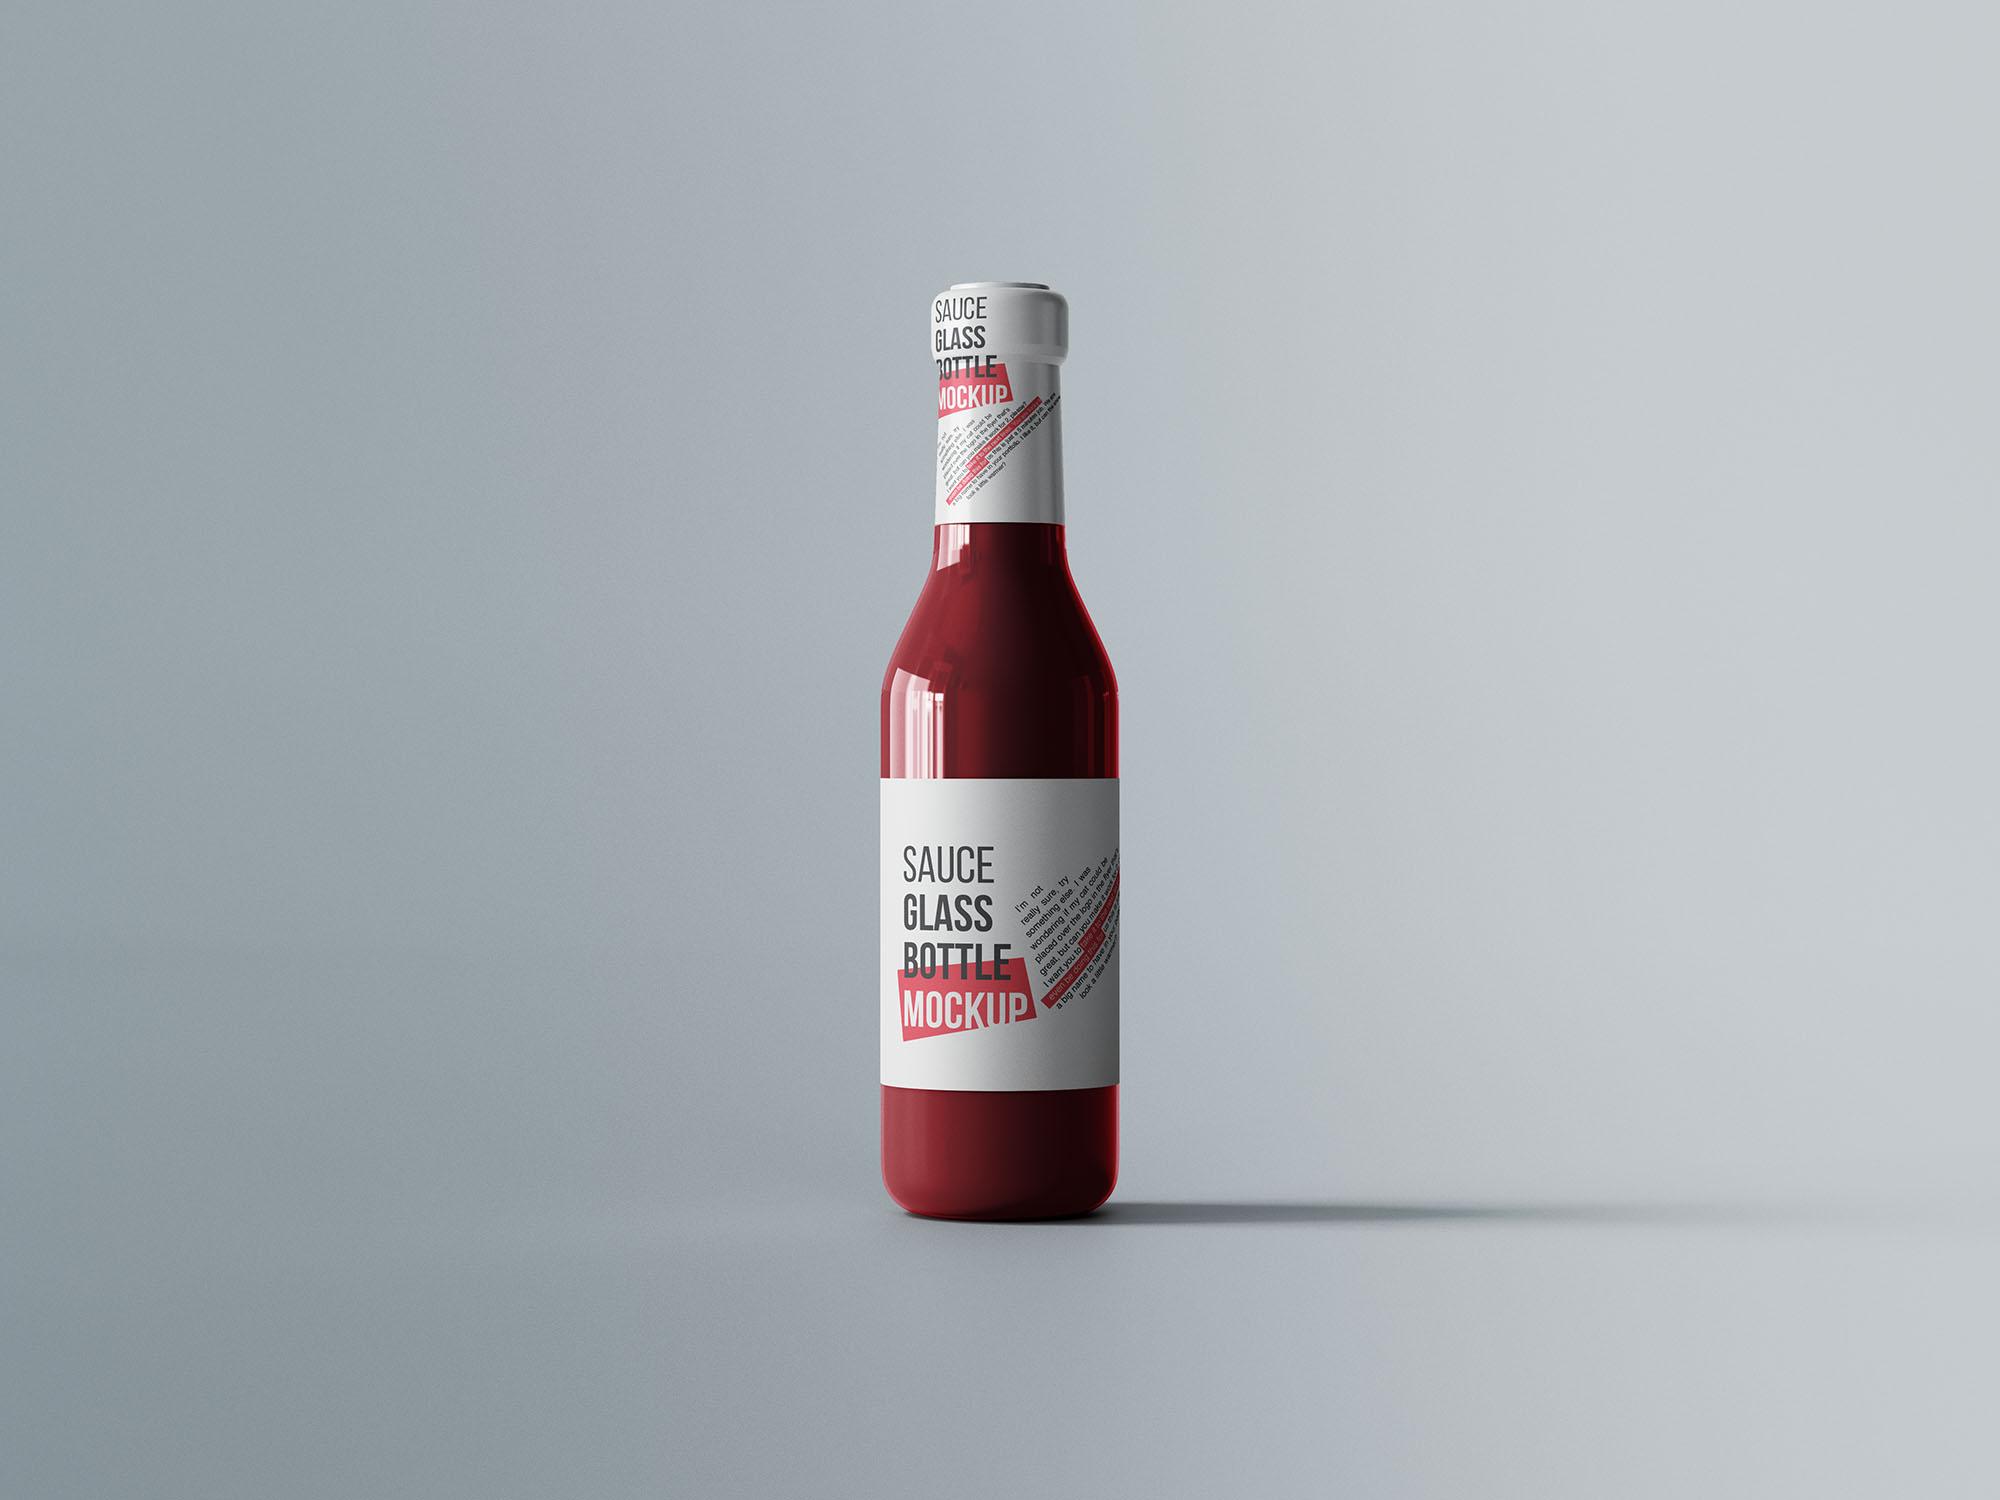 Sauce Glass Bottle Mockup